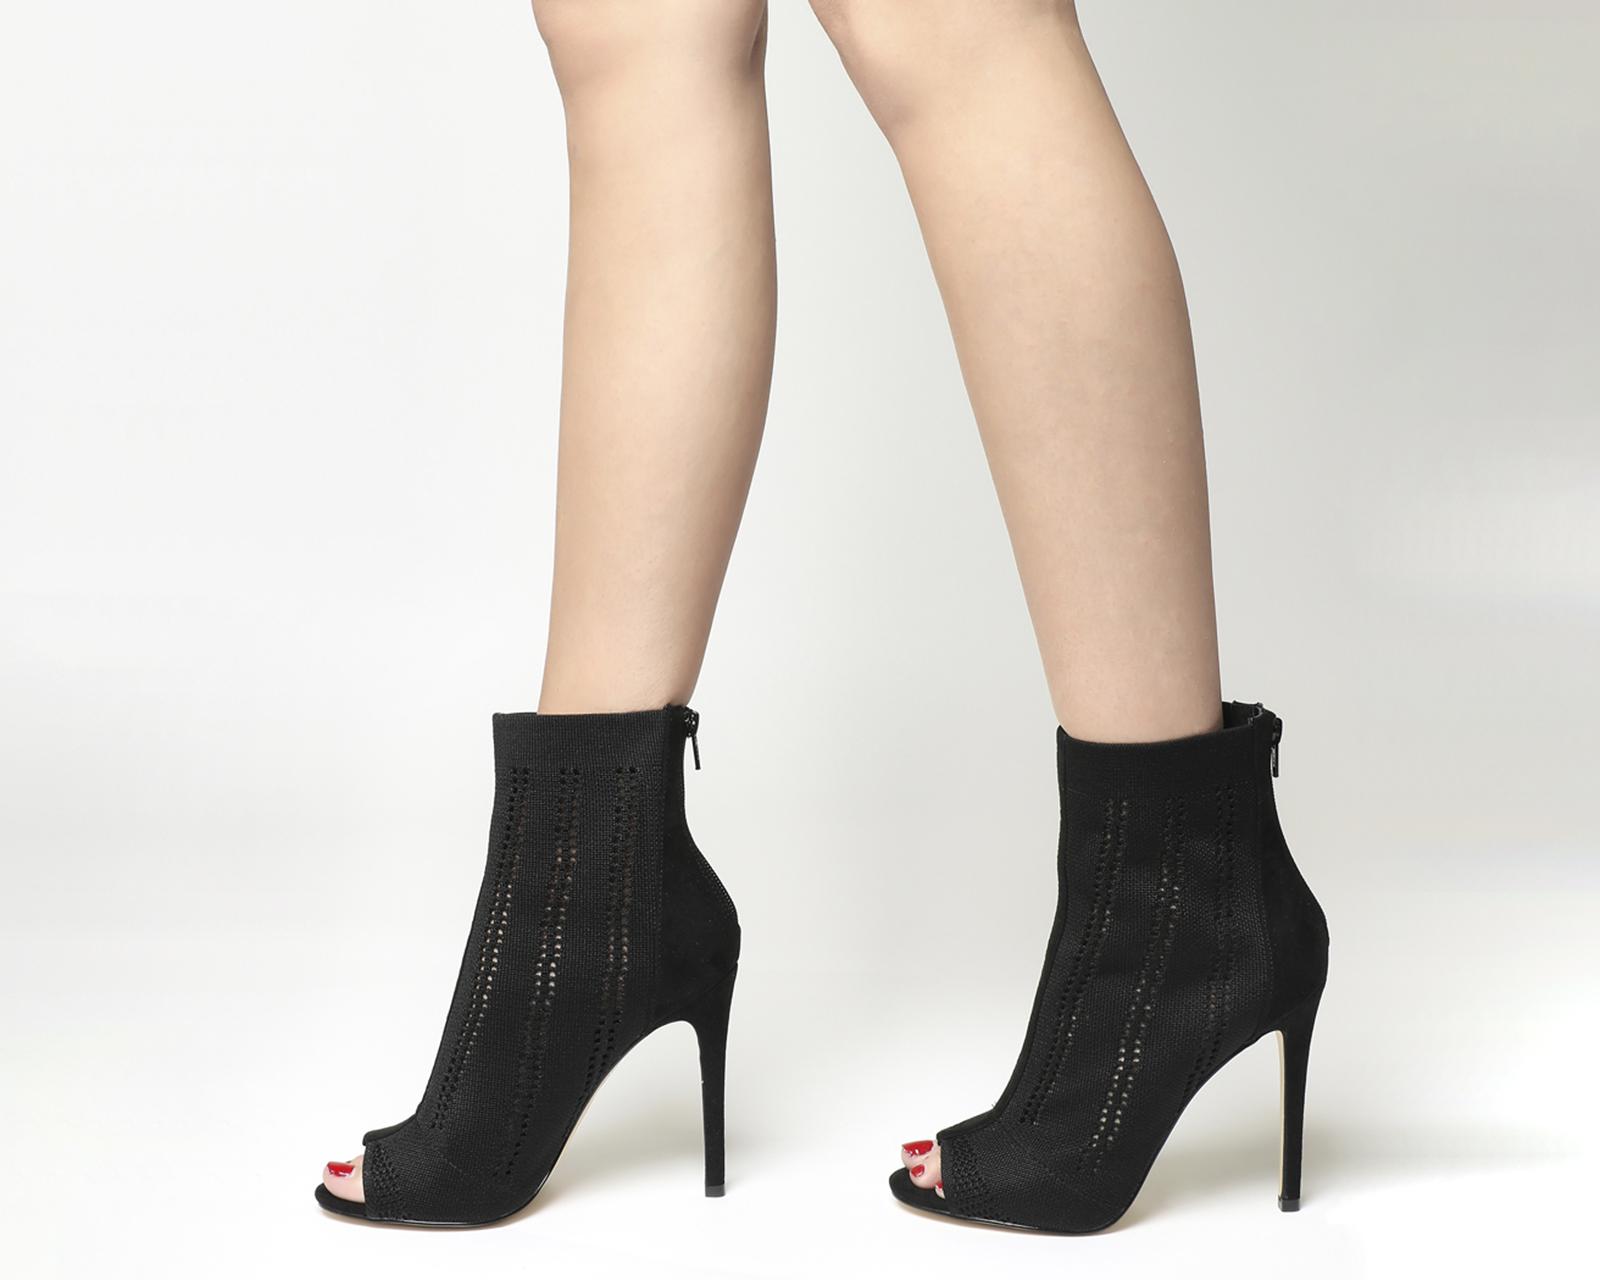 0158dee286a Sentinel Womens Office Lipstick Peep Toe Shoe Boots Black Knit Boots